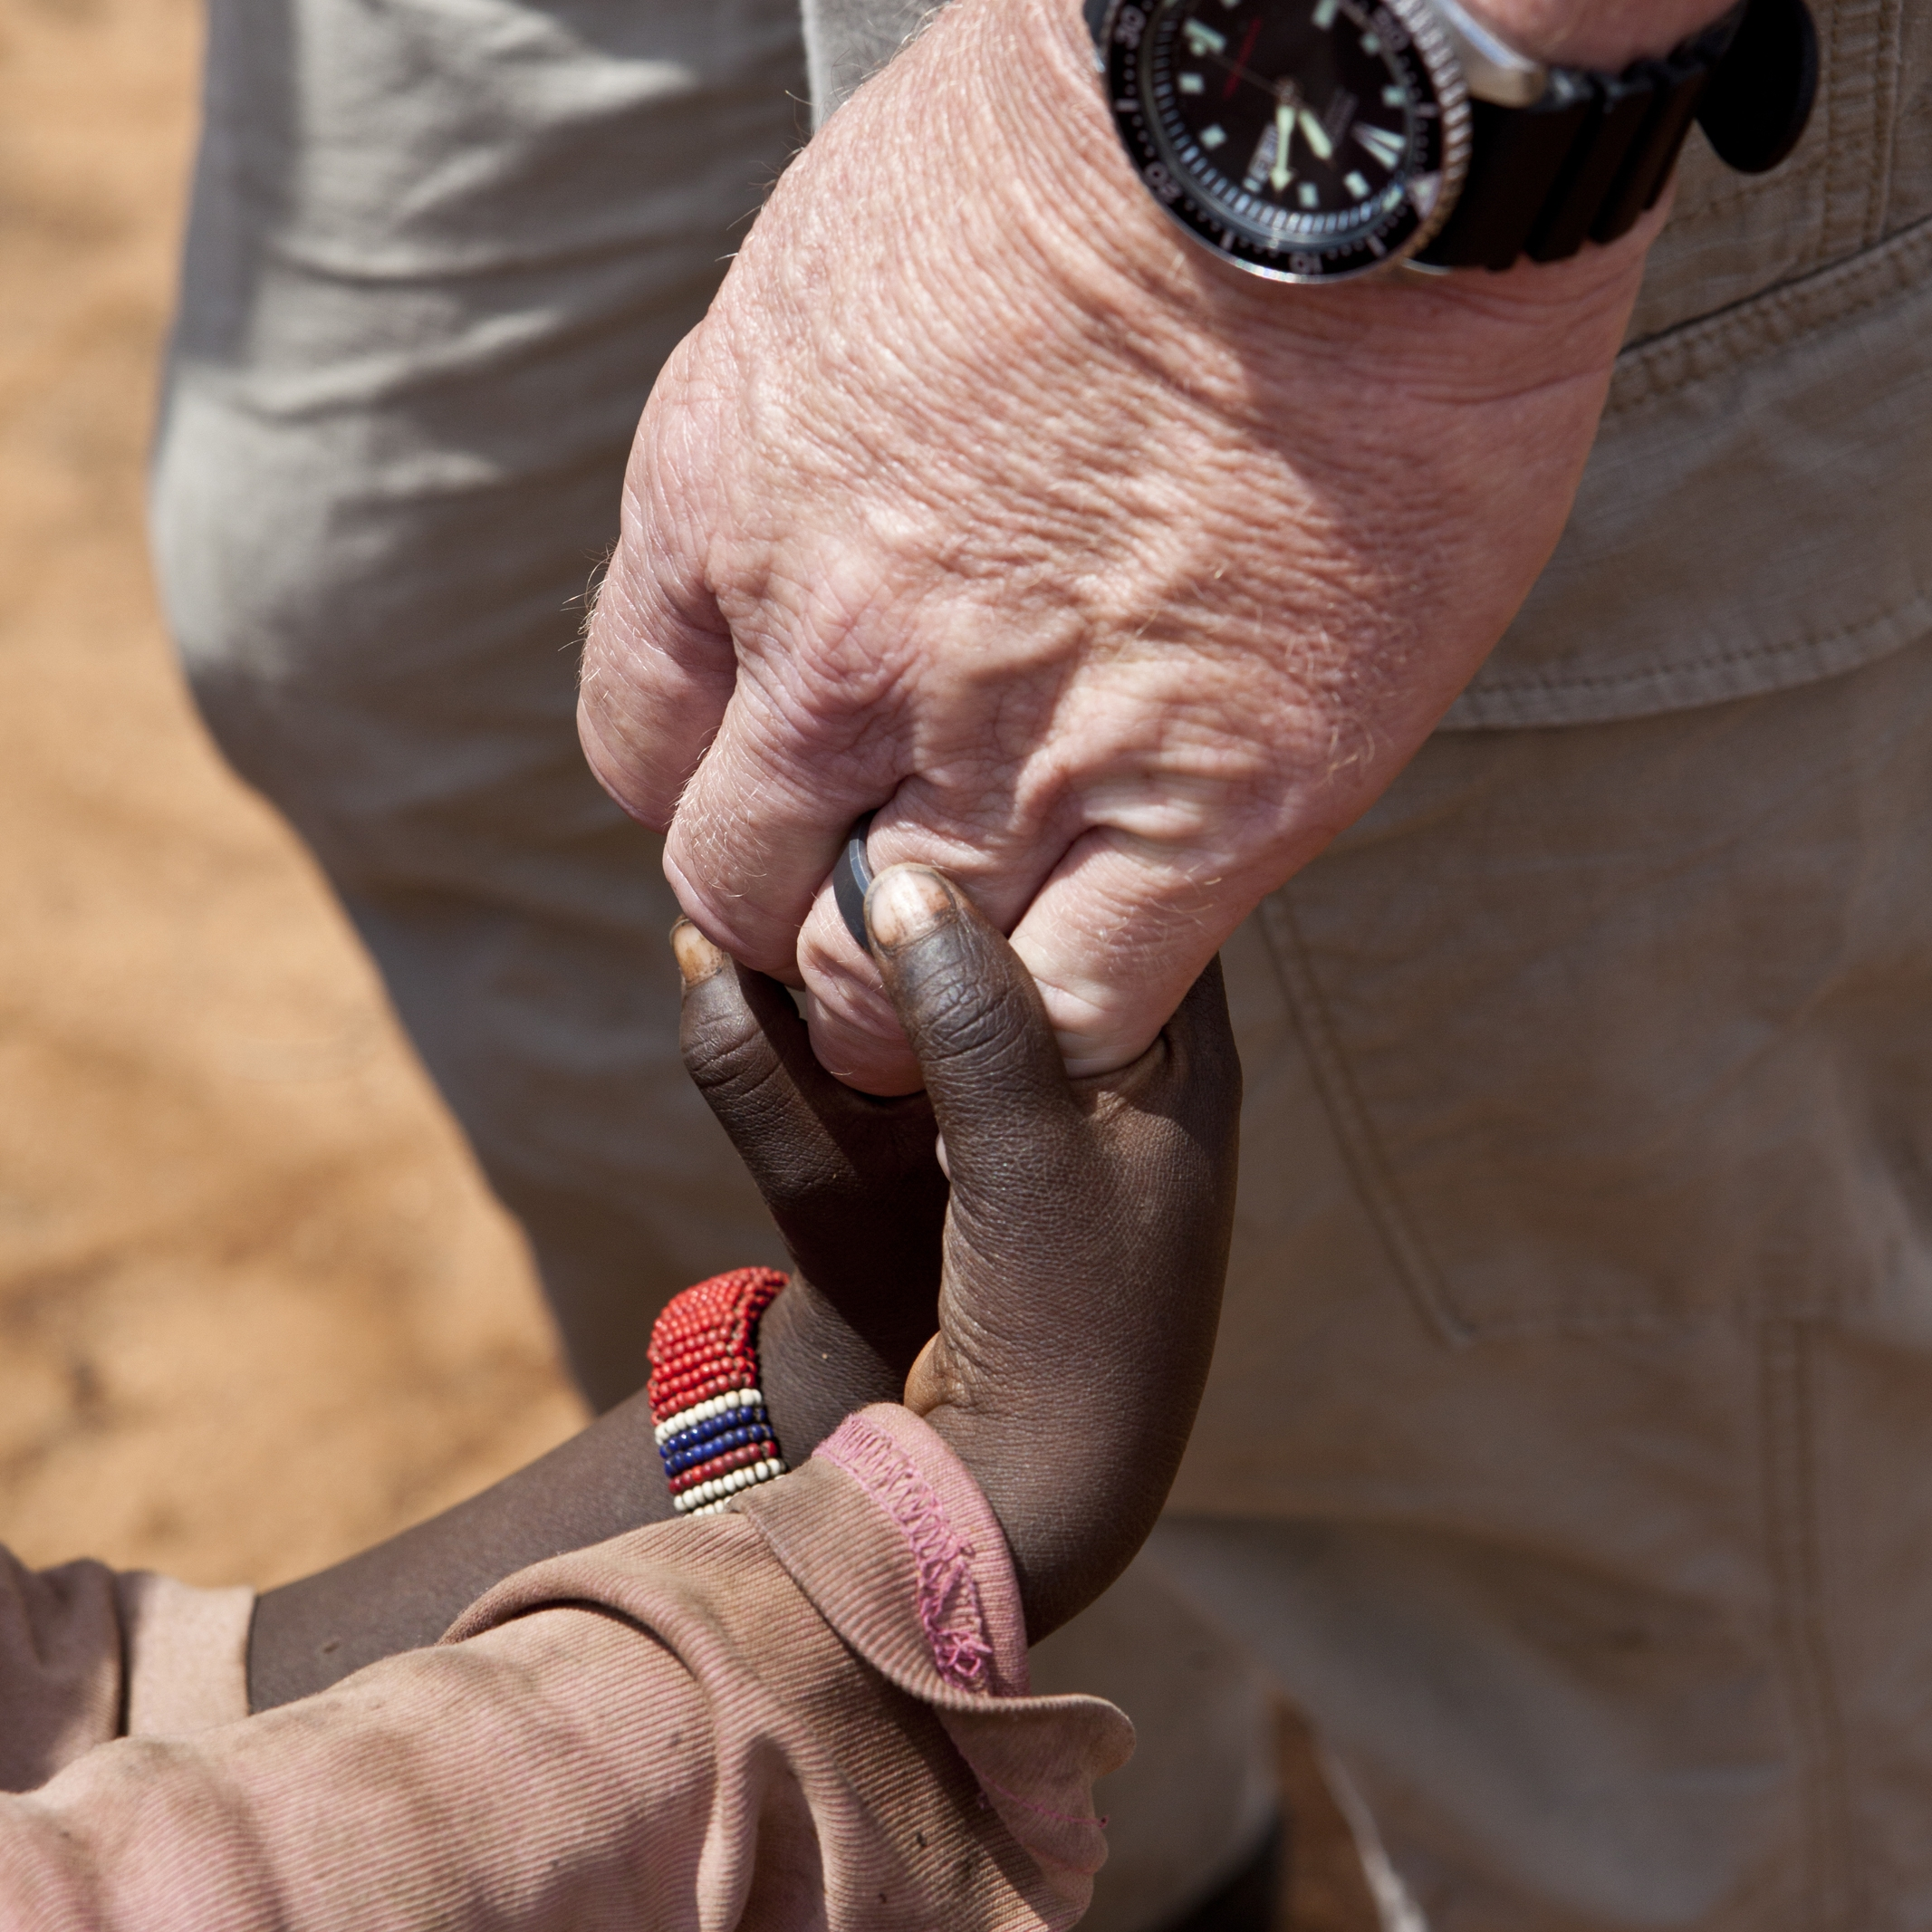 aid-workers-hands-holding-childrens-hands-PZVDV7U.jpg